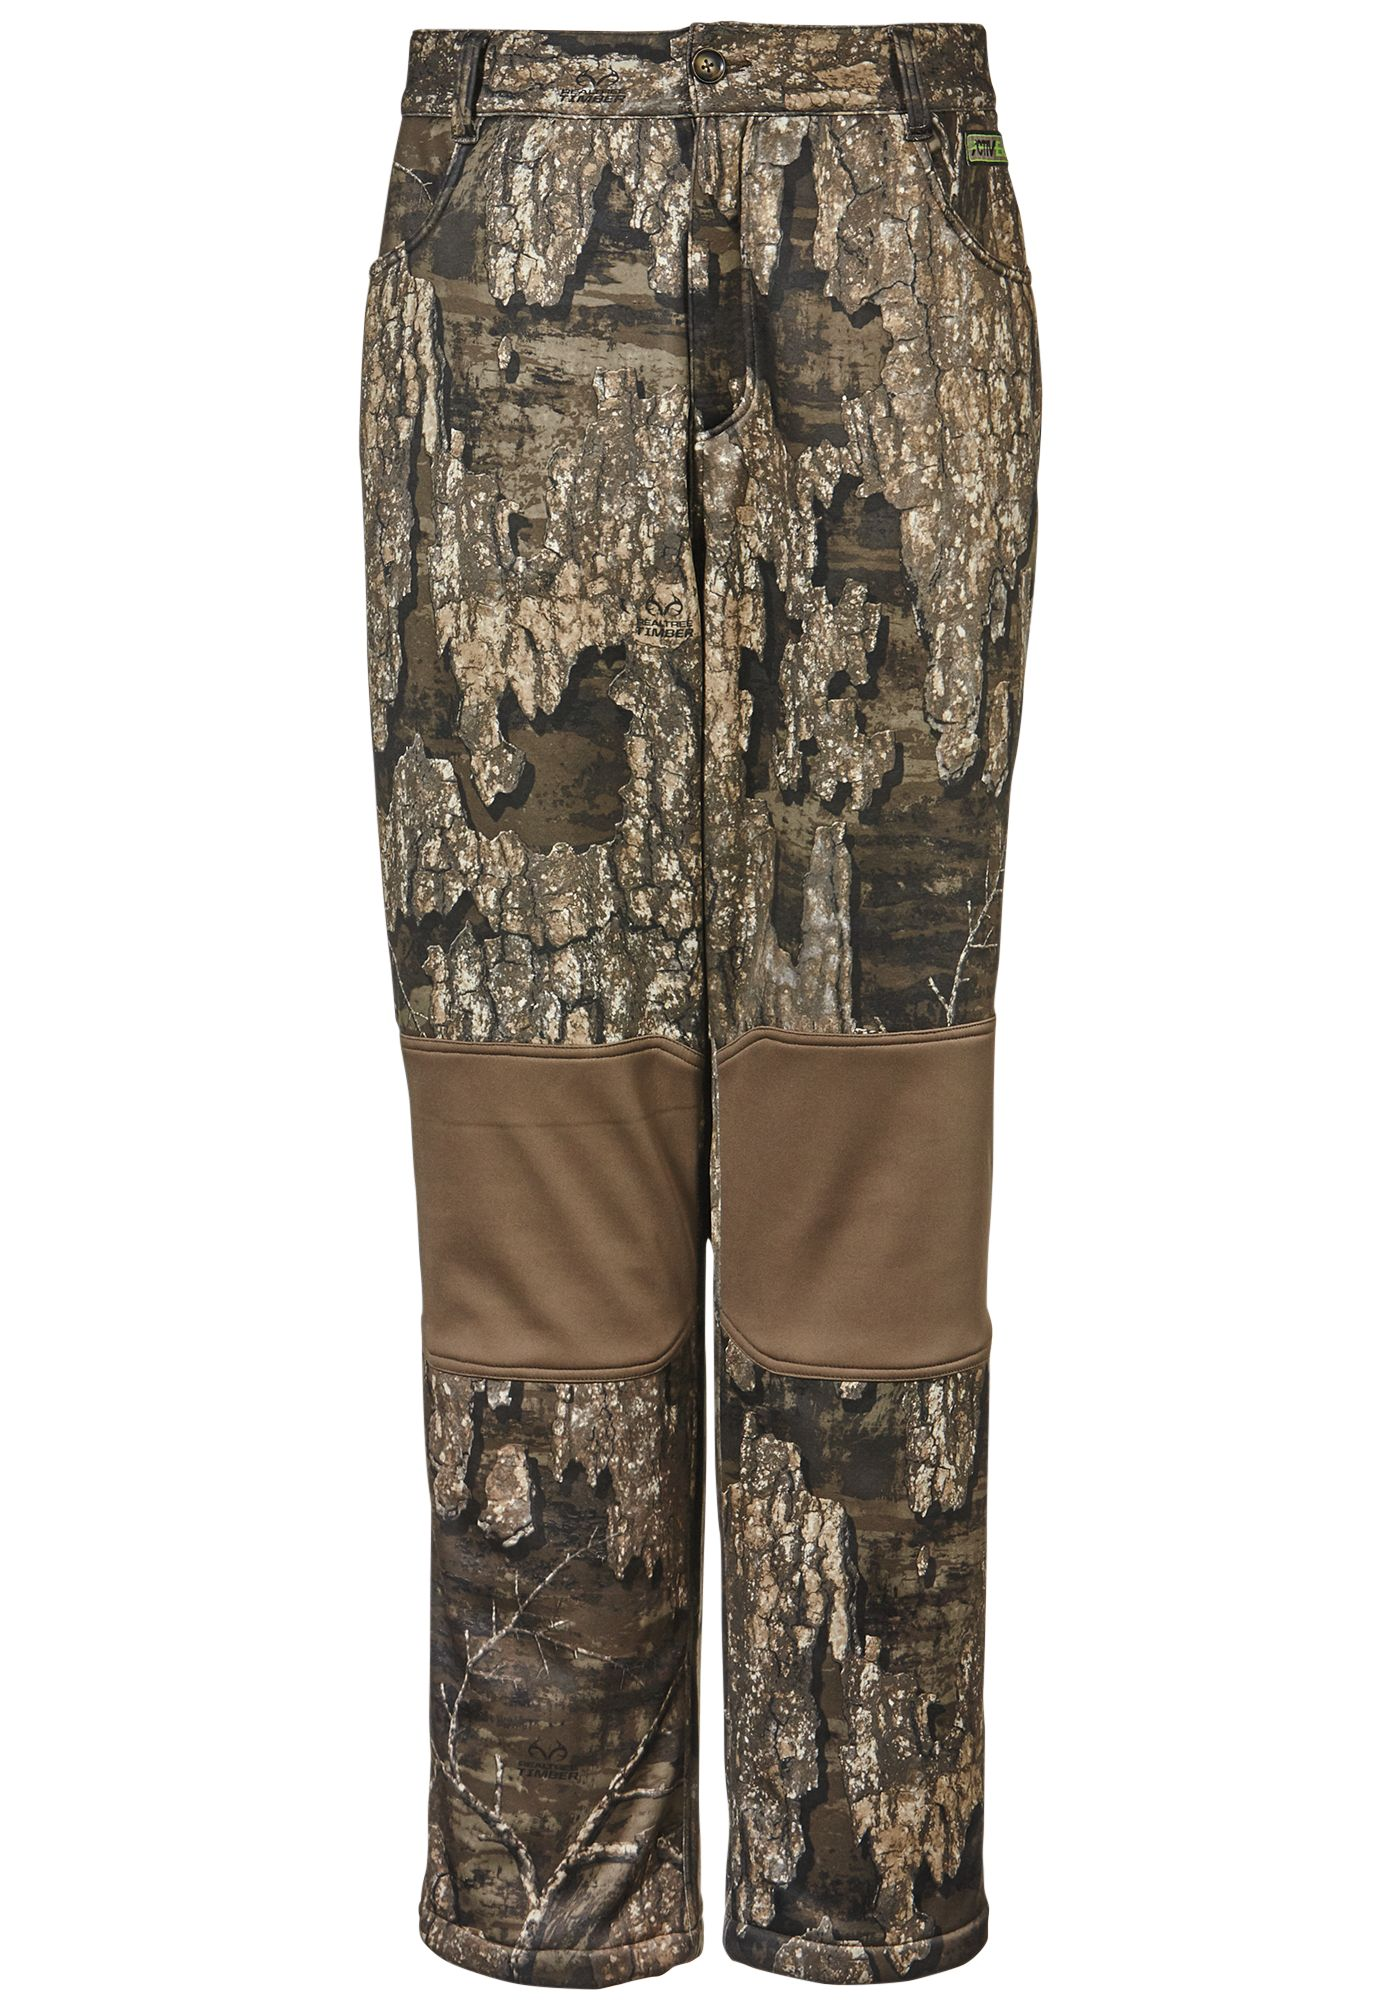 Drake Waterfowl Men's Non-Typical Endurance Hunting Pants